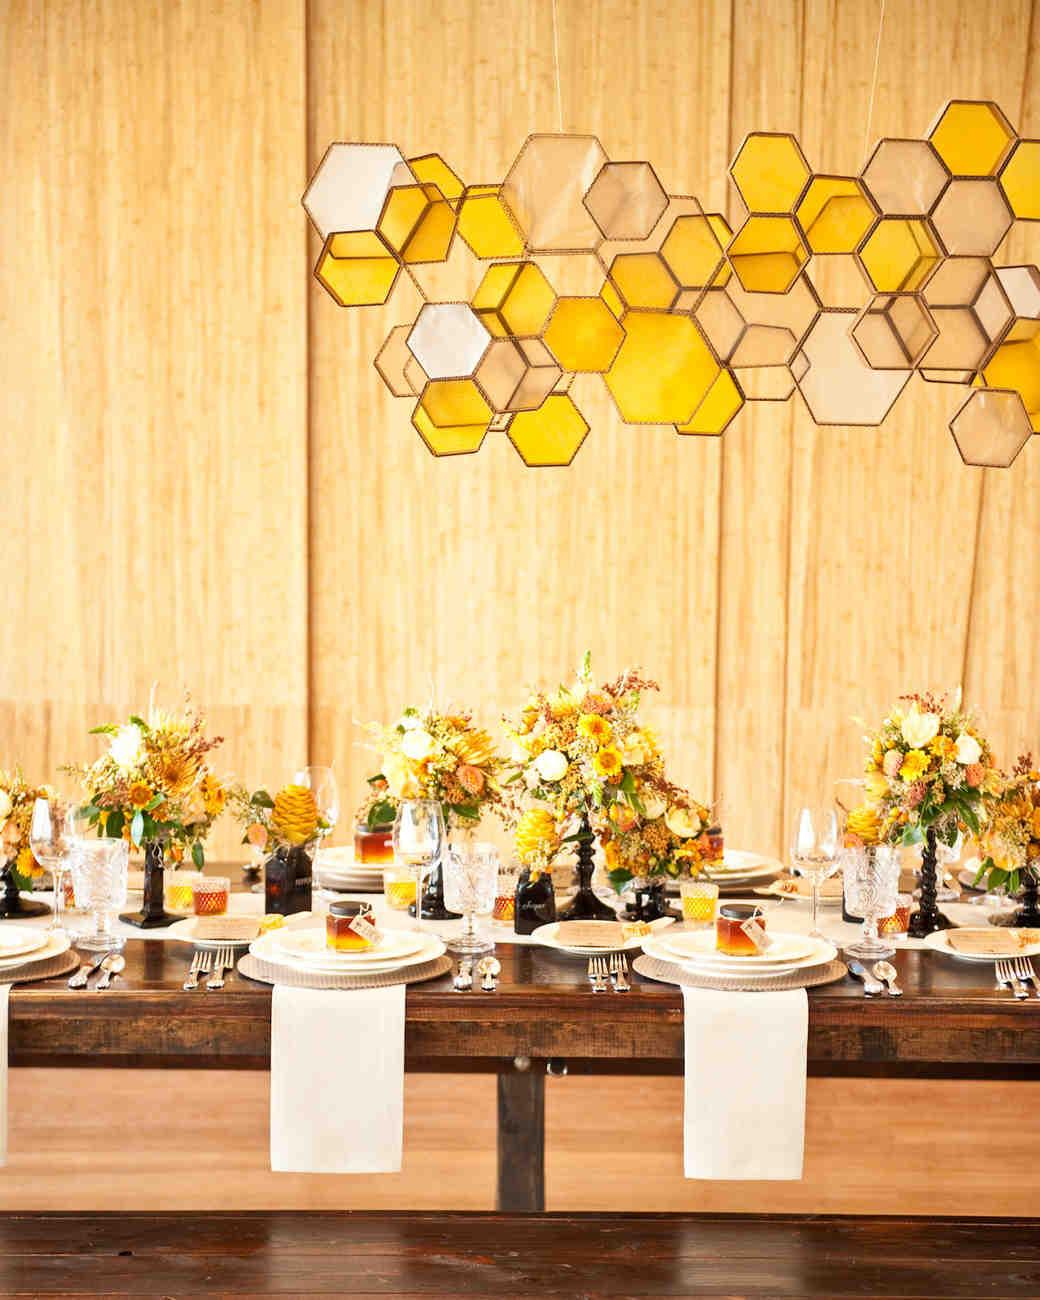 Honeycomb Wedding Inspiration, Hanging Honeycomb Light Installation